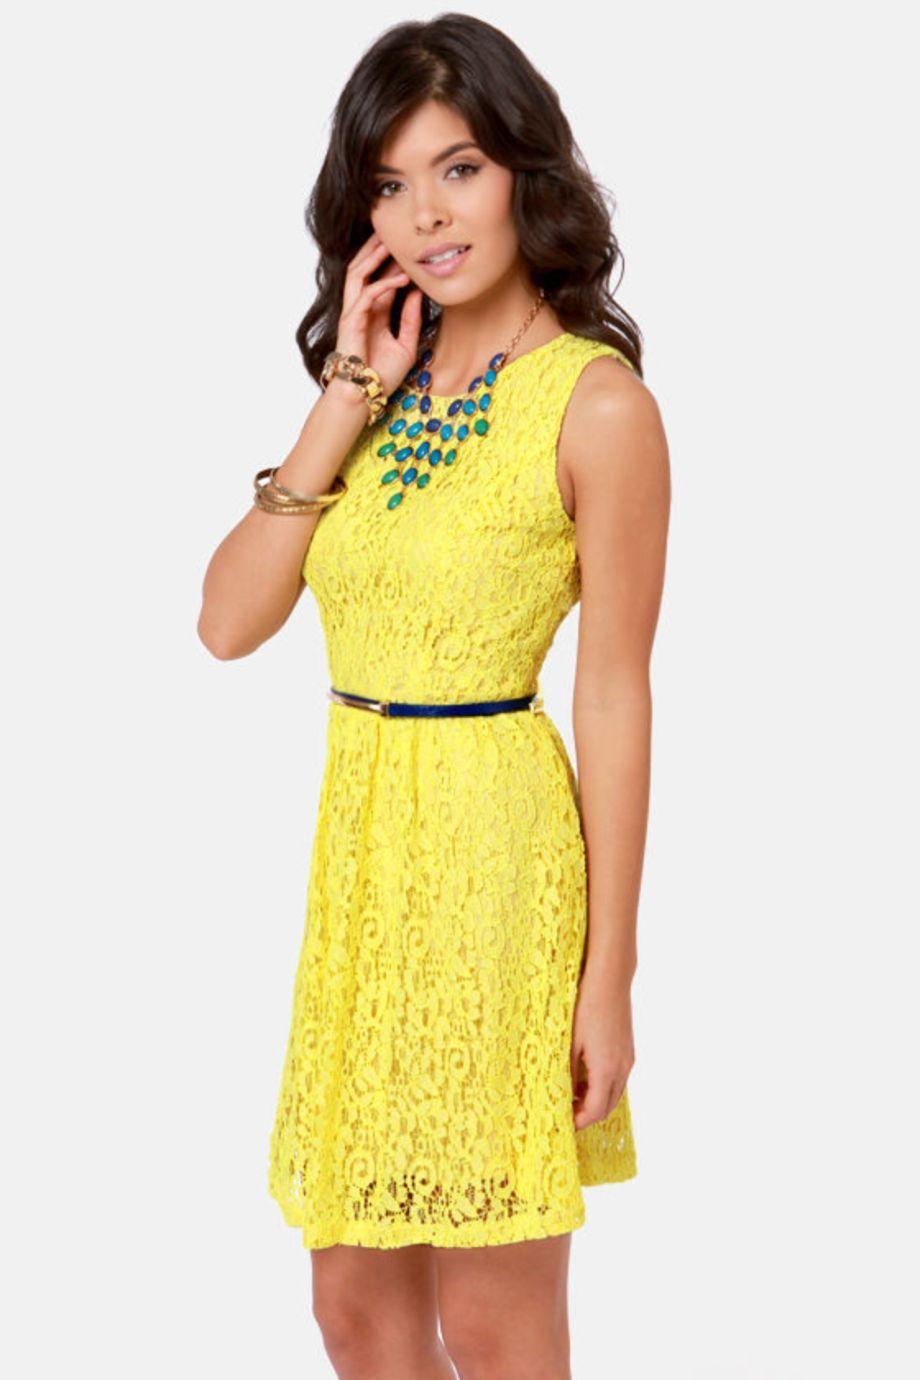 Yellow dress to wedding   Inspiring Yellow Lace Wedding Dress Ideas  Dress ideas Lace